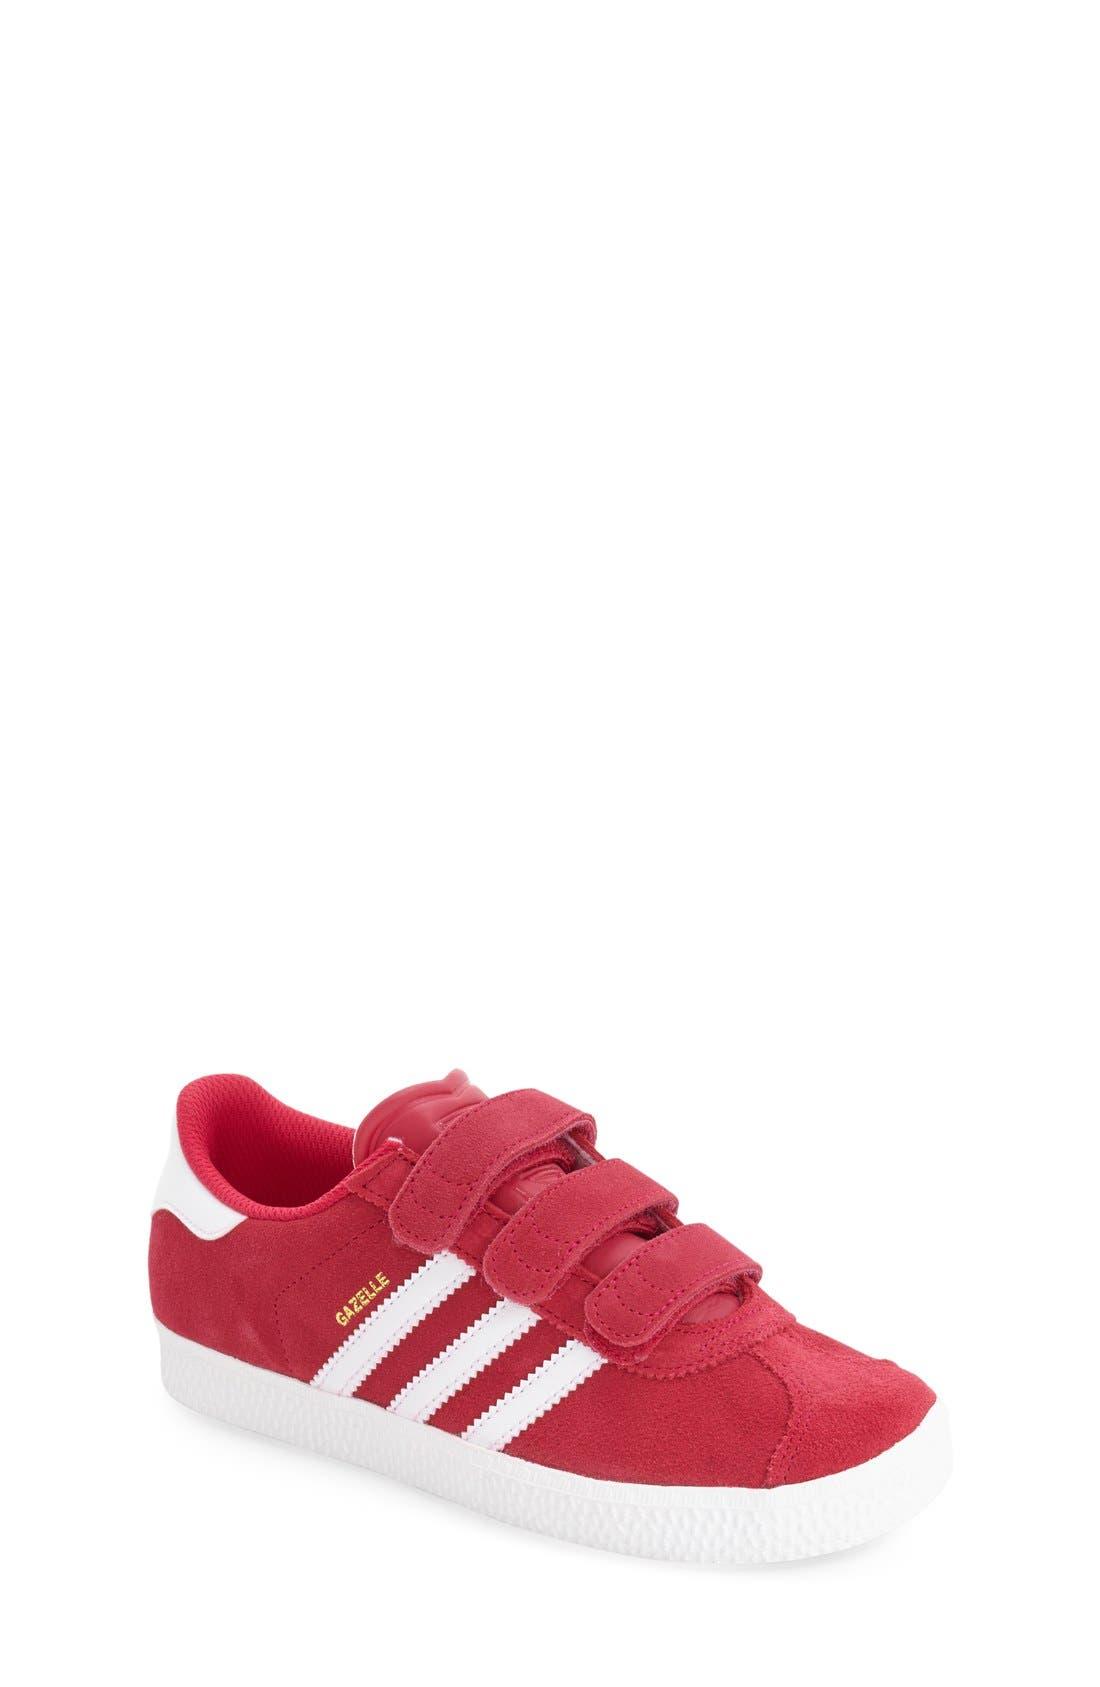 Gazelle Sneaker,                             Main thumbnail 1, color,                             Pink